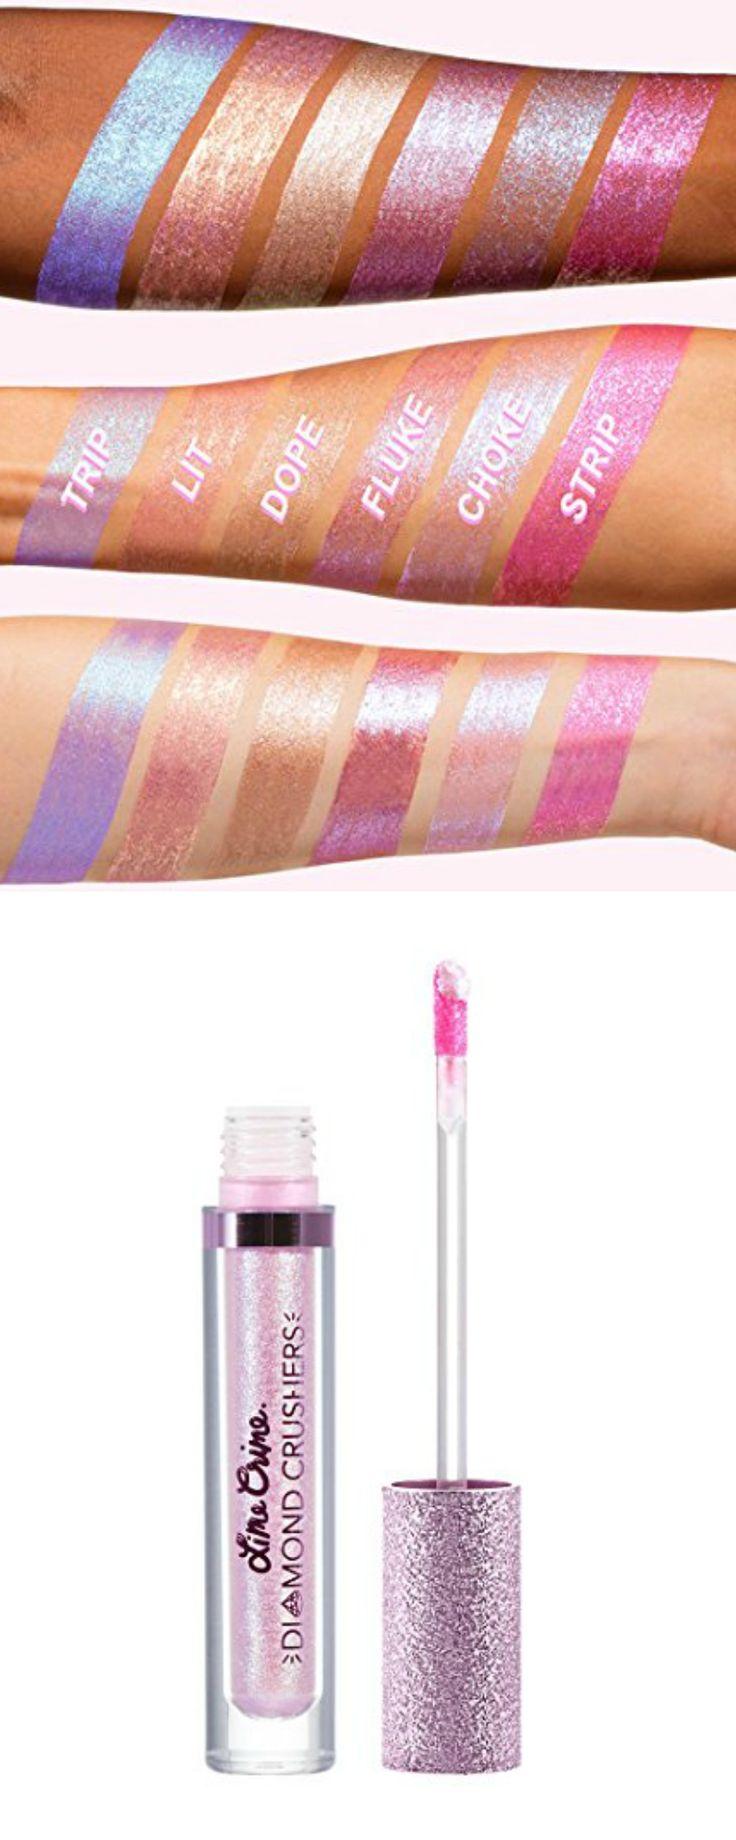 Lime Crime Diamond Crusher Lip Gloss on Amazon #diamond #crushers #lime #crime #lip #gloss #glitter